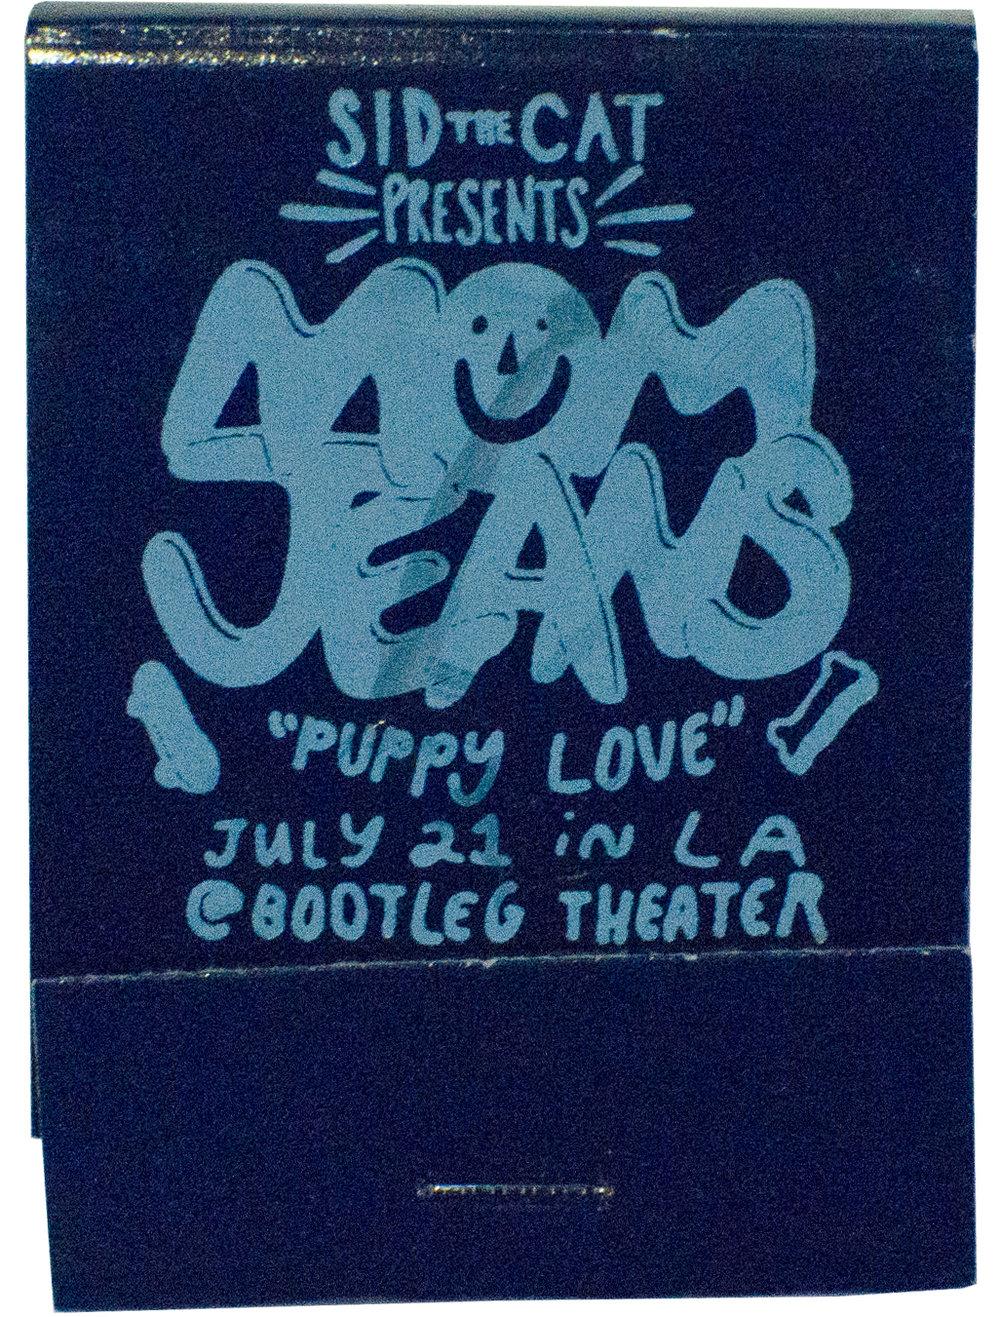 2018-7-21 Mom Jeans.jpg